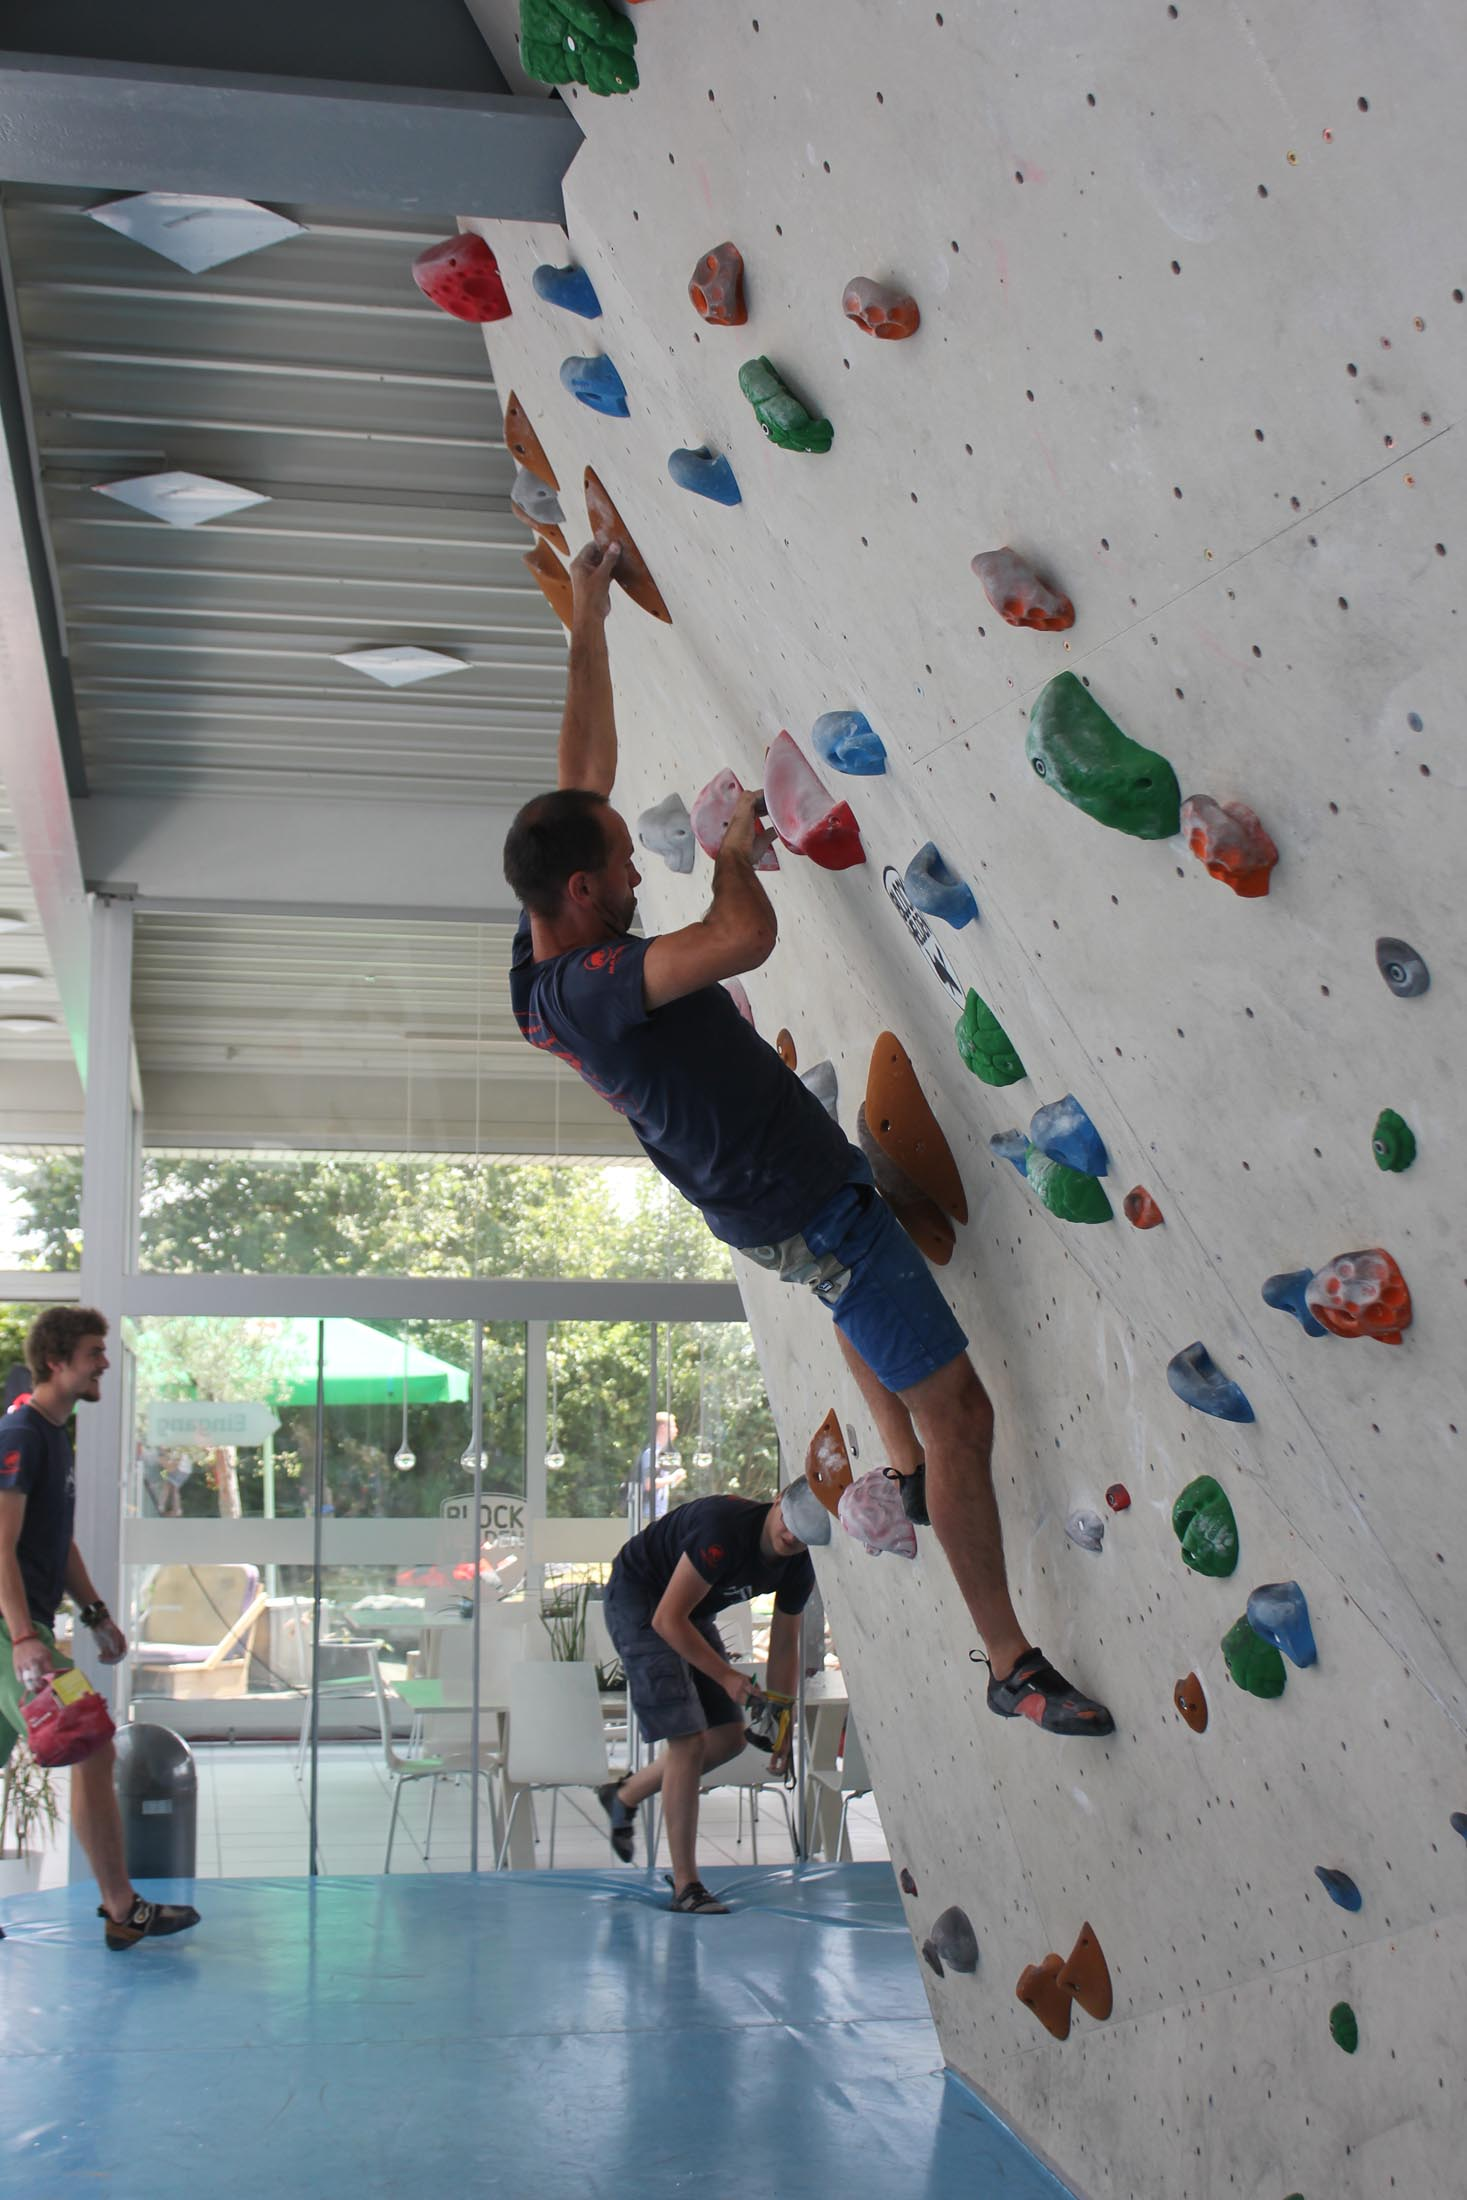 Quali, internationaler bouldercup Frankenjura 2016, BLOCKHELDEN Erlangen, Mammut, Bergfreunde.de, Boulderwettkampf07092016110